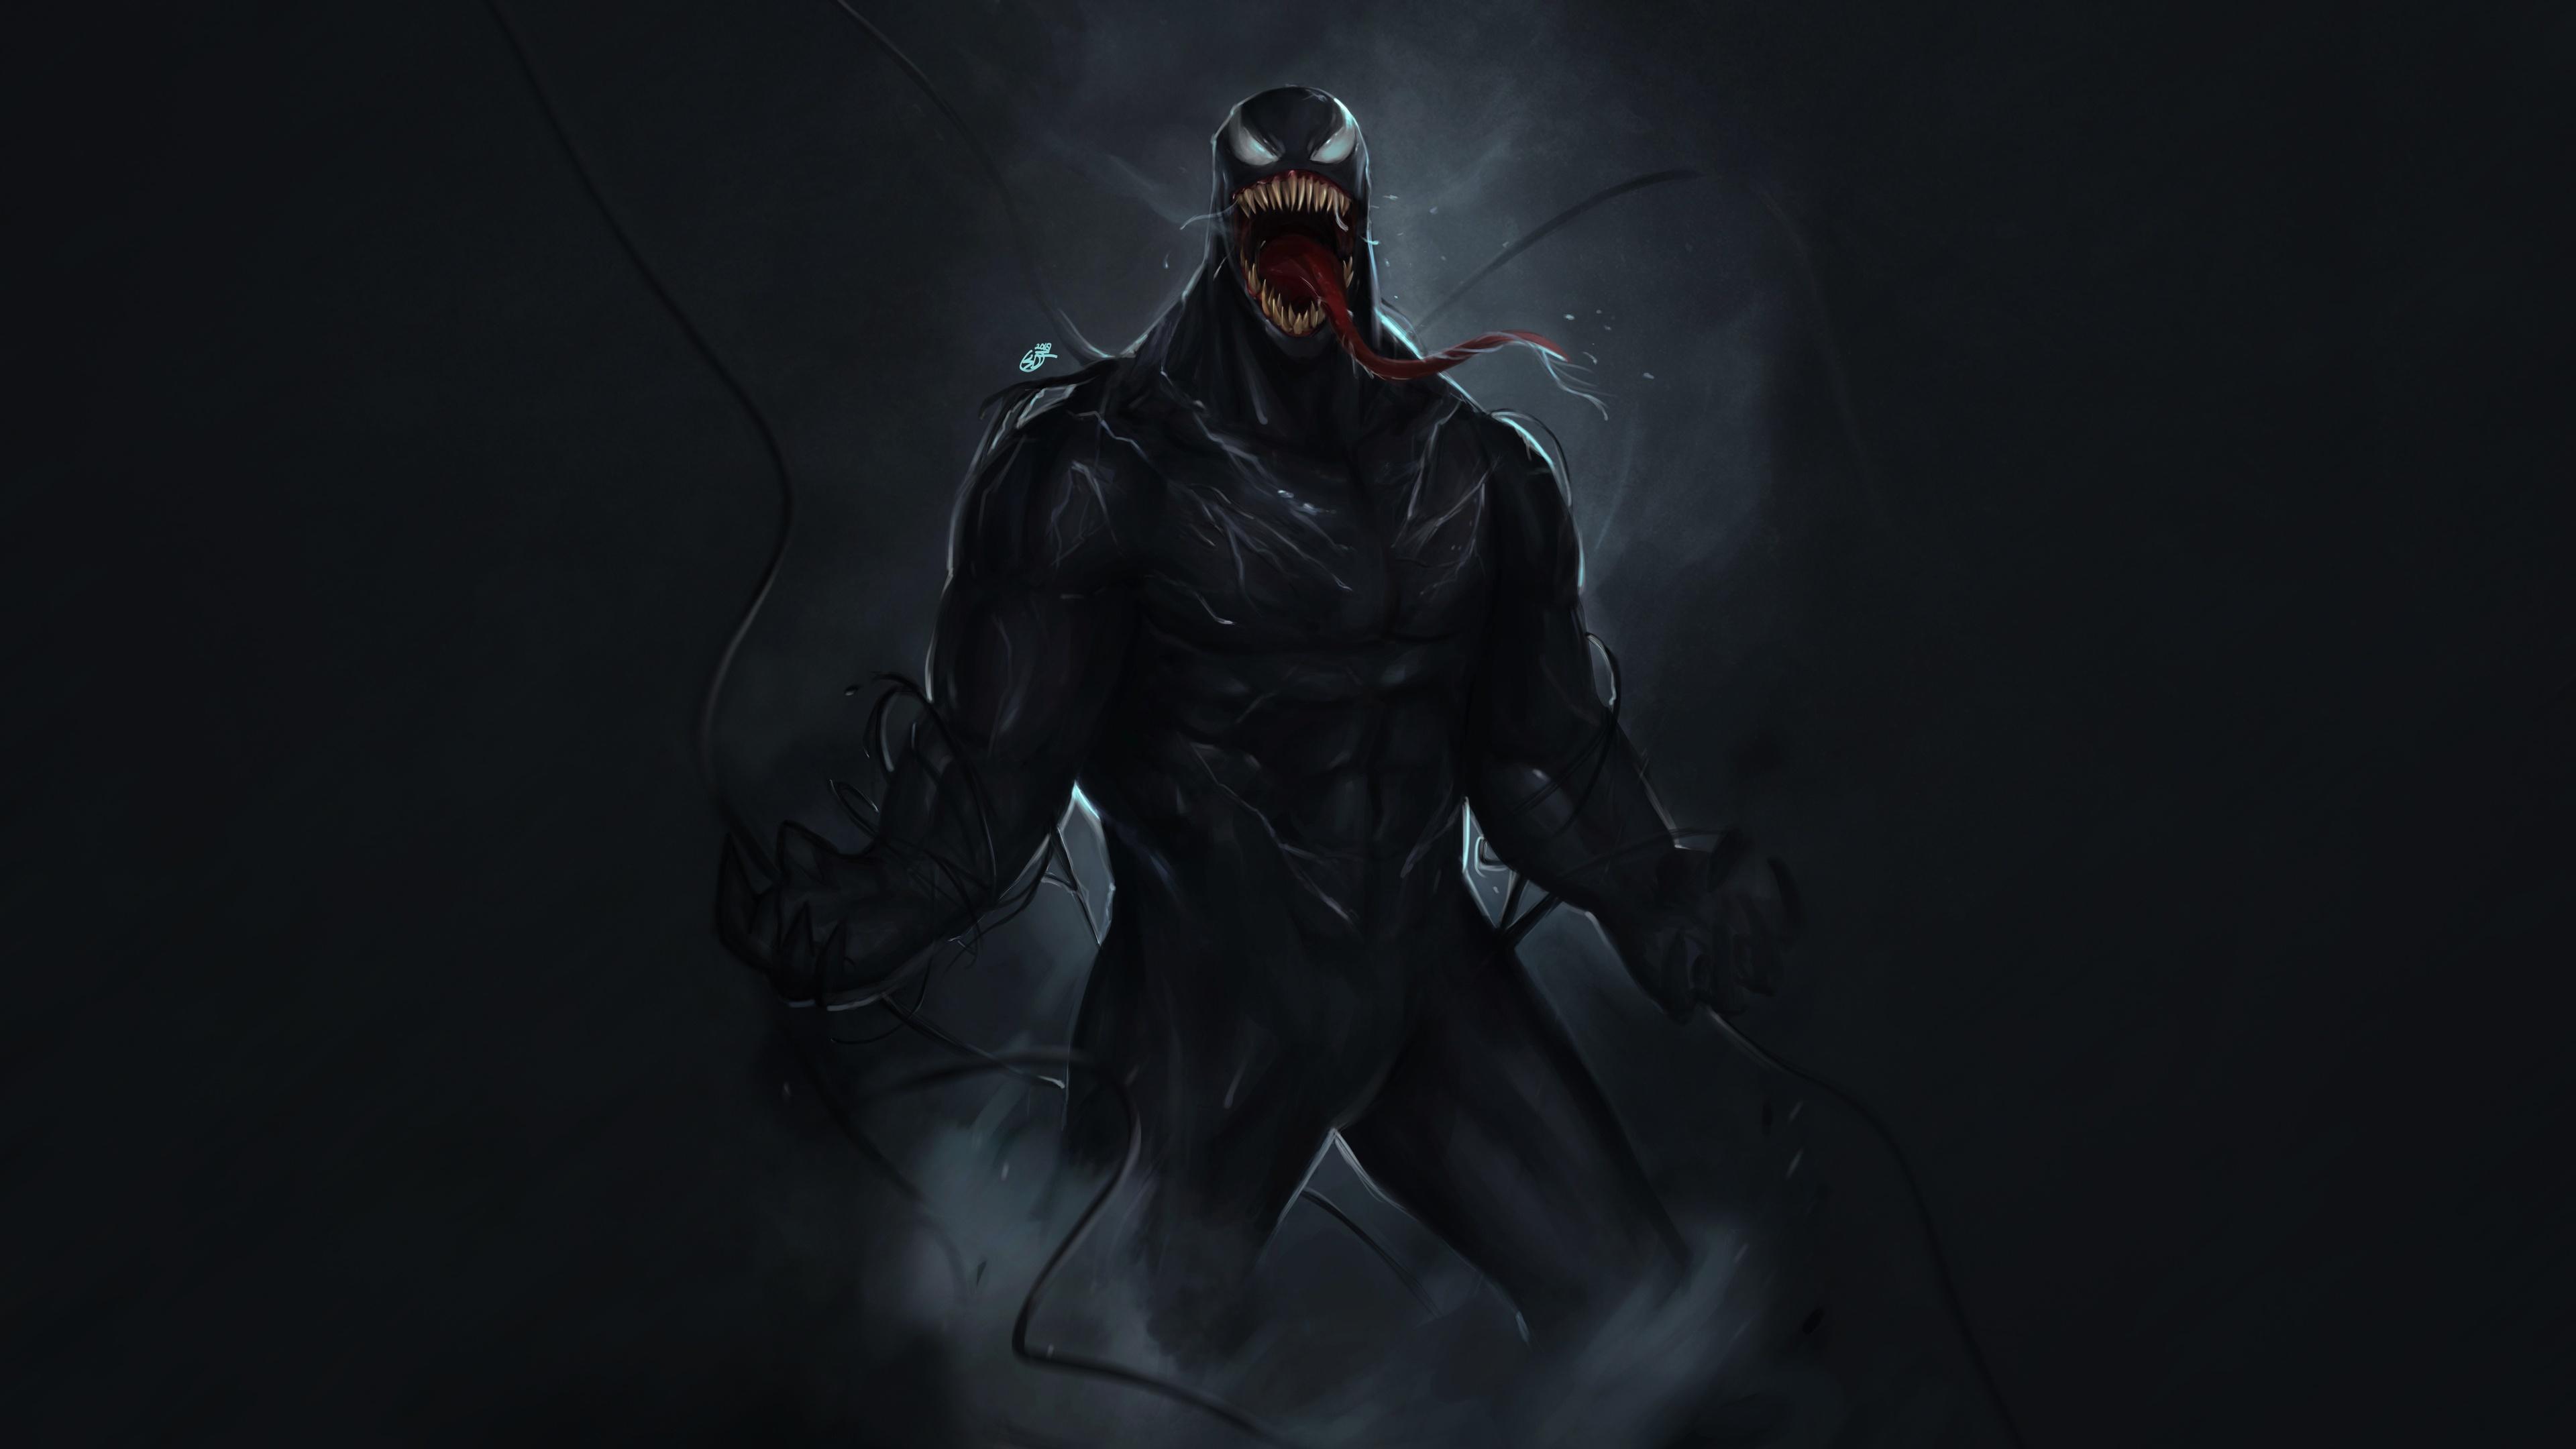 Venom marvel comic superhero 4k venom wallpapers superheroes wallpapers hd wallpapers digital - Marvel hd wallpapers 4k ...